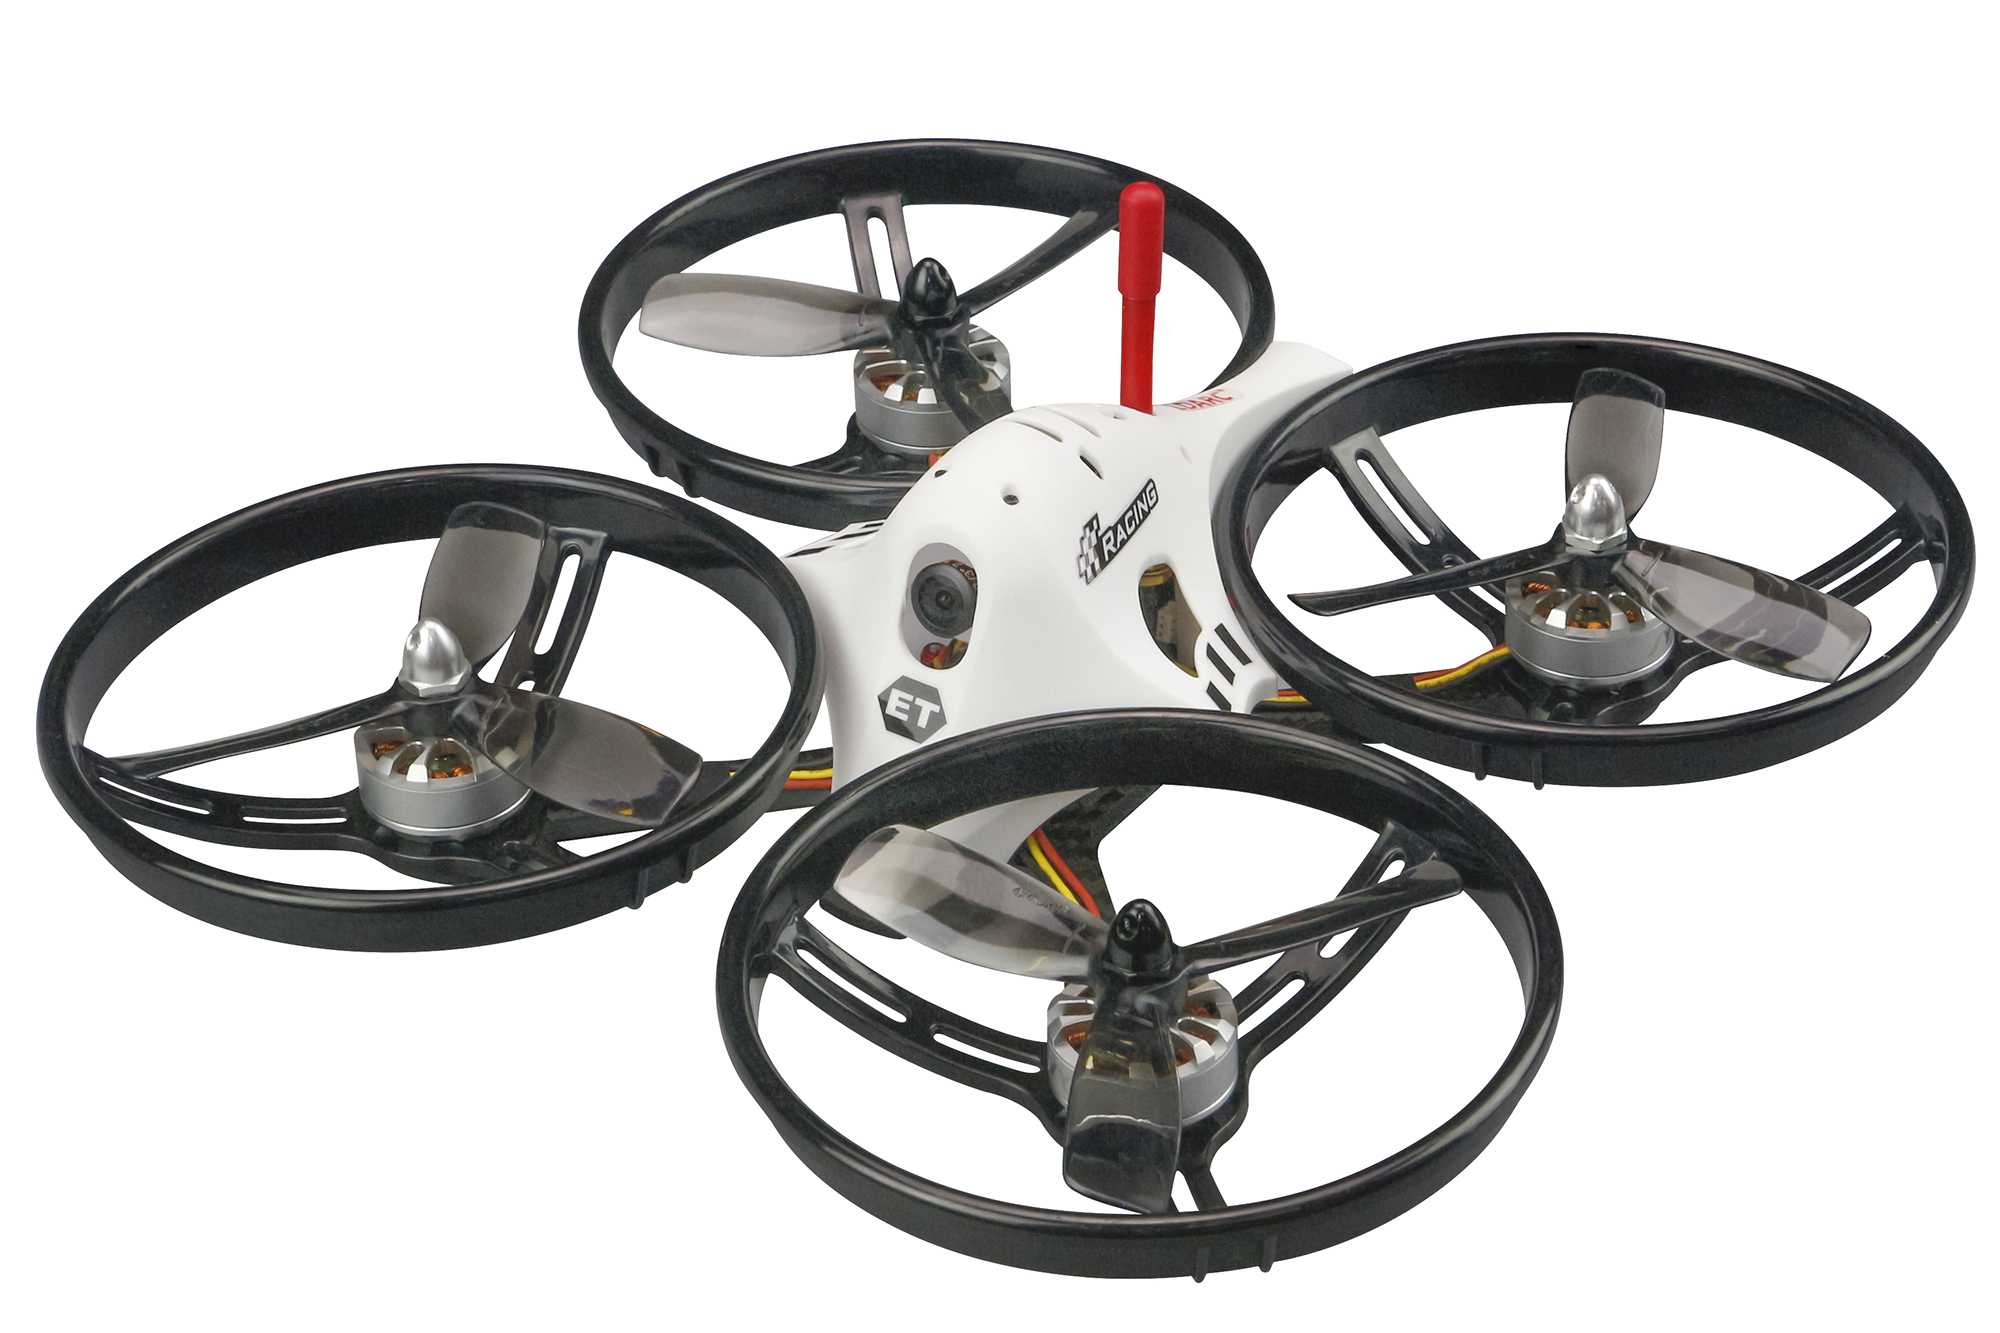 LDARC ET MAX PNP KK-tower 20a F4+OSD flight controller 1200tvl camera mini quadcopter drone for beginner